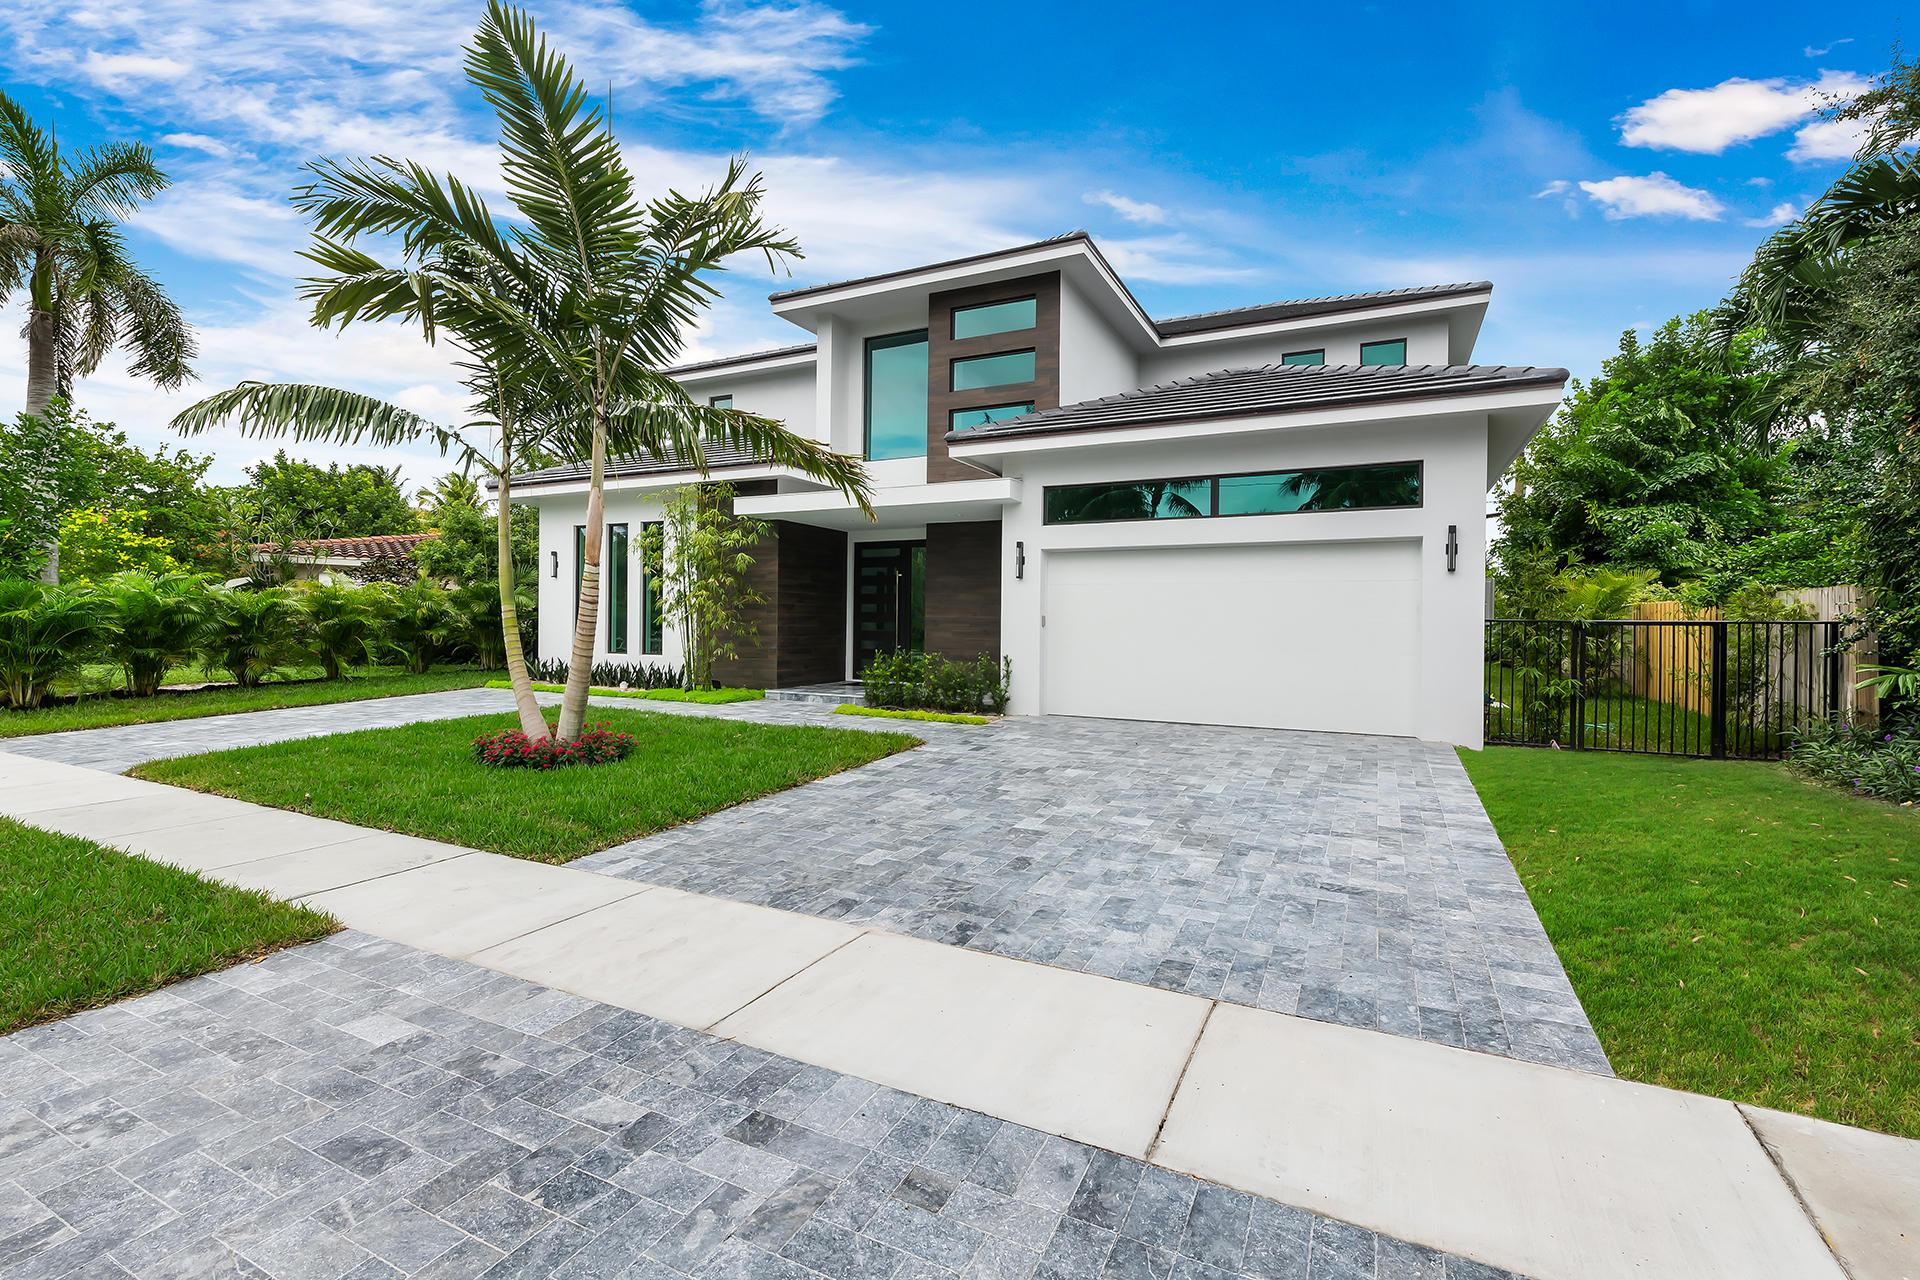 Home for sale in Boca Villa Boca Raton Florida